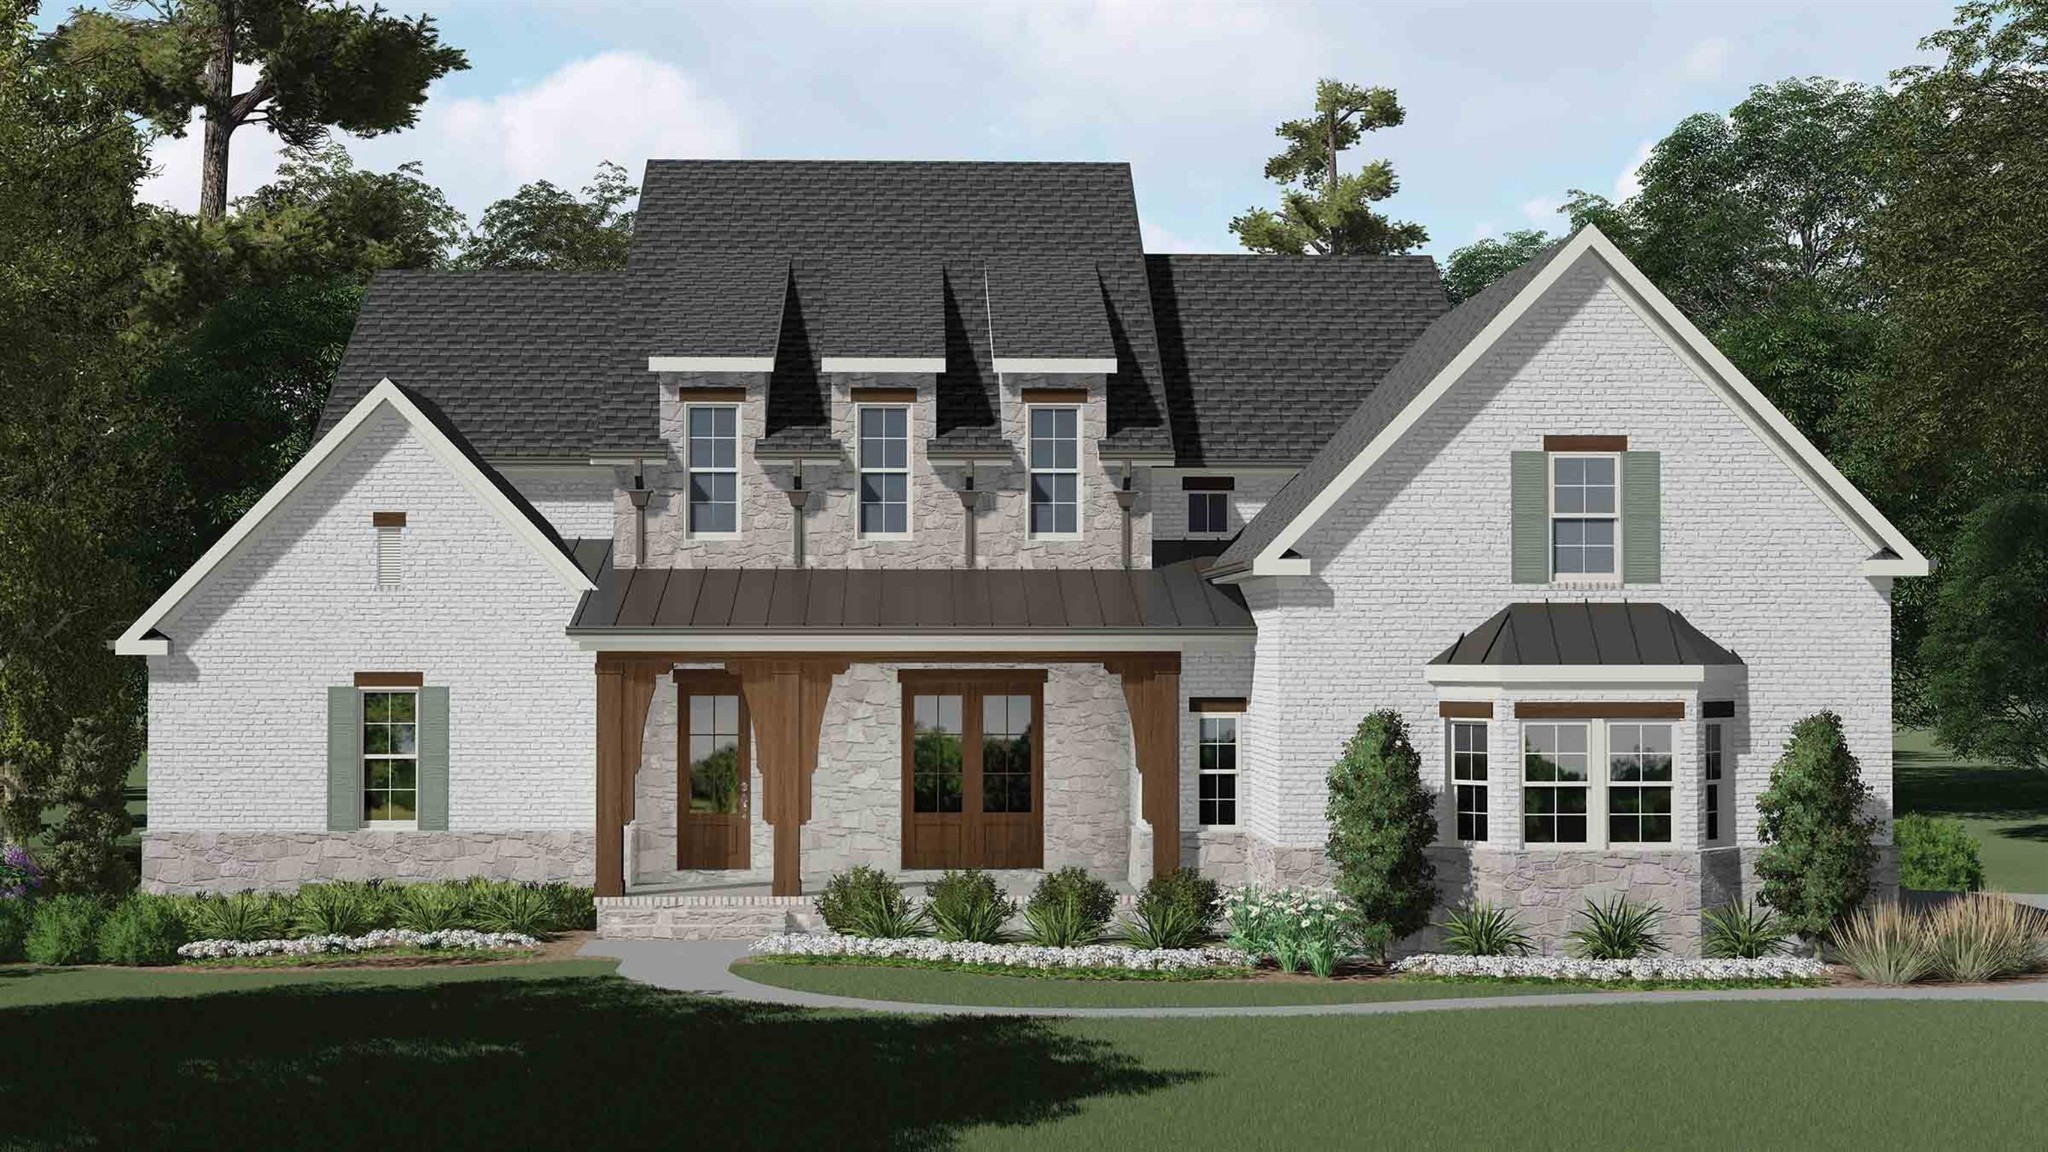 1540 Foxland Blvd, Gallatin, TN 37066 - Gallatin, TN real estate listing